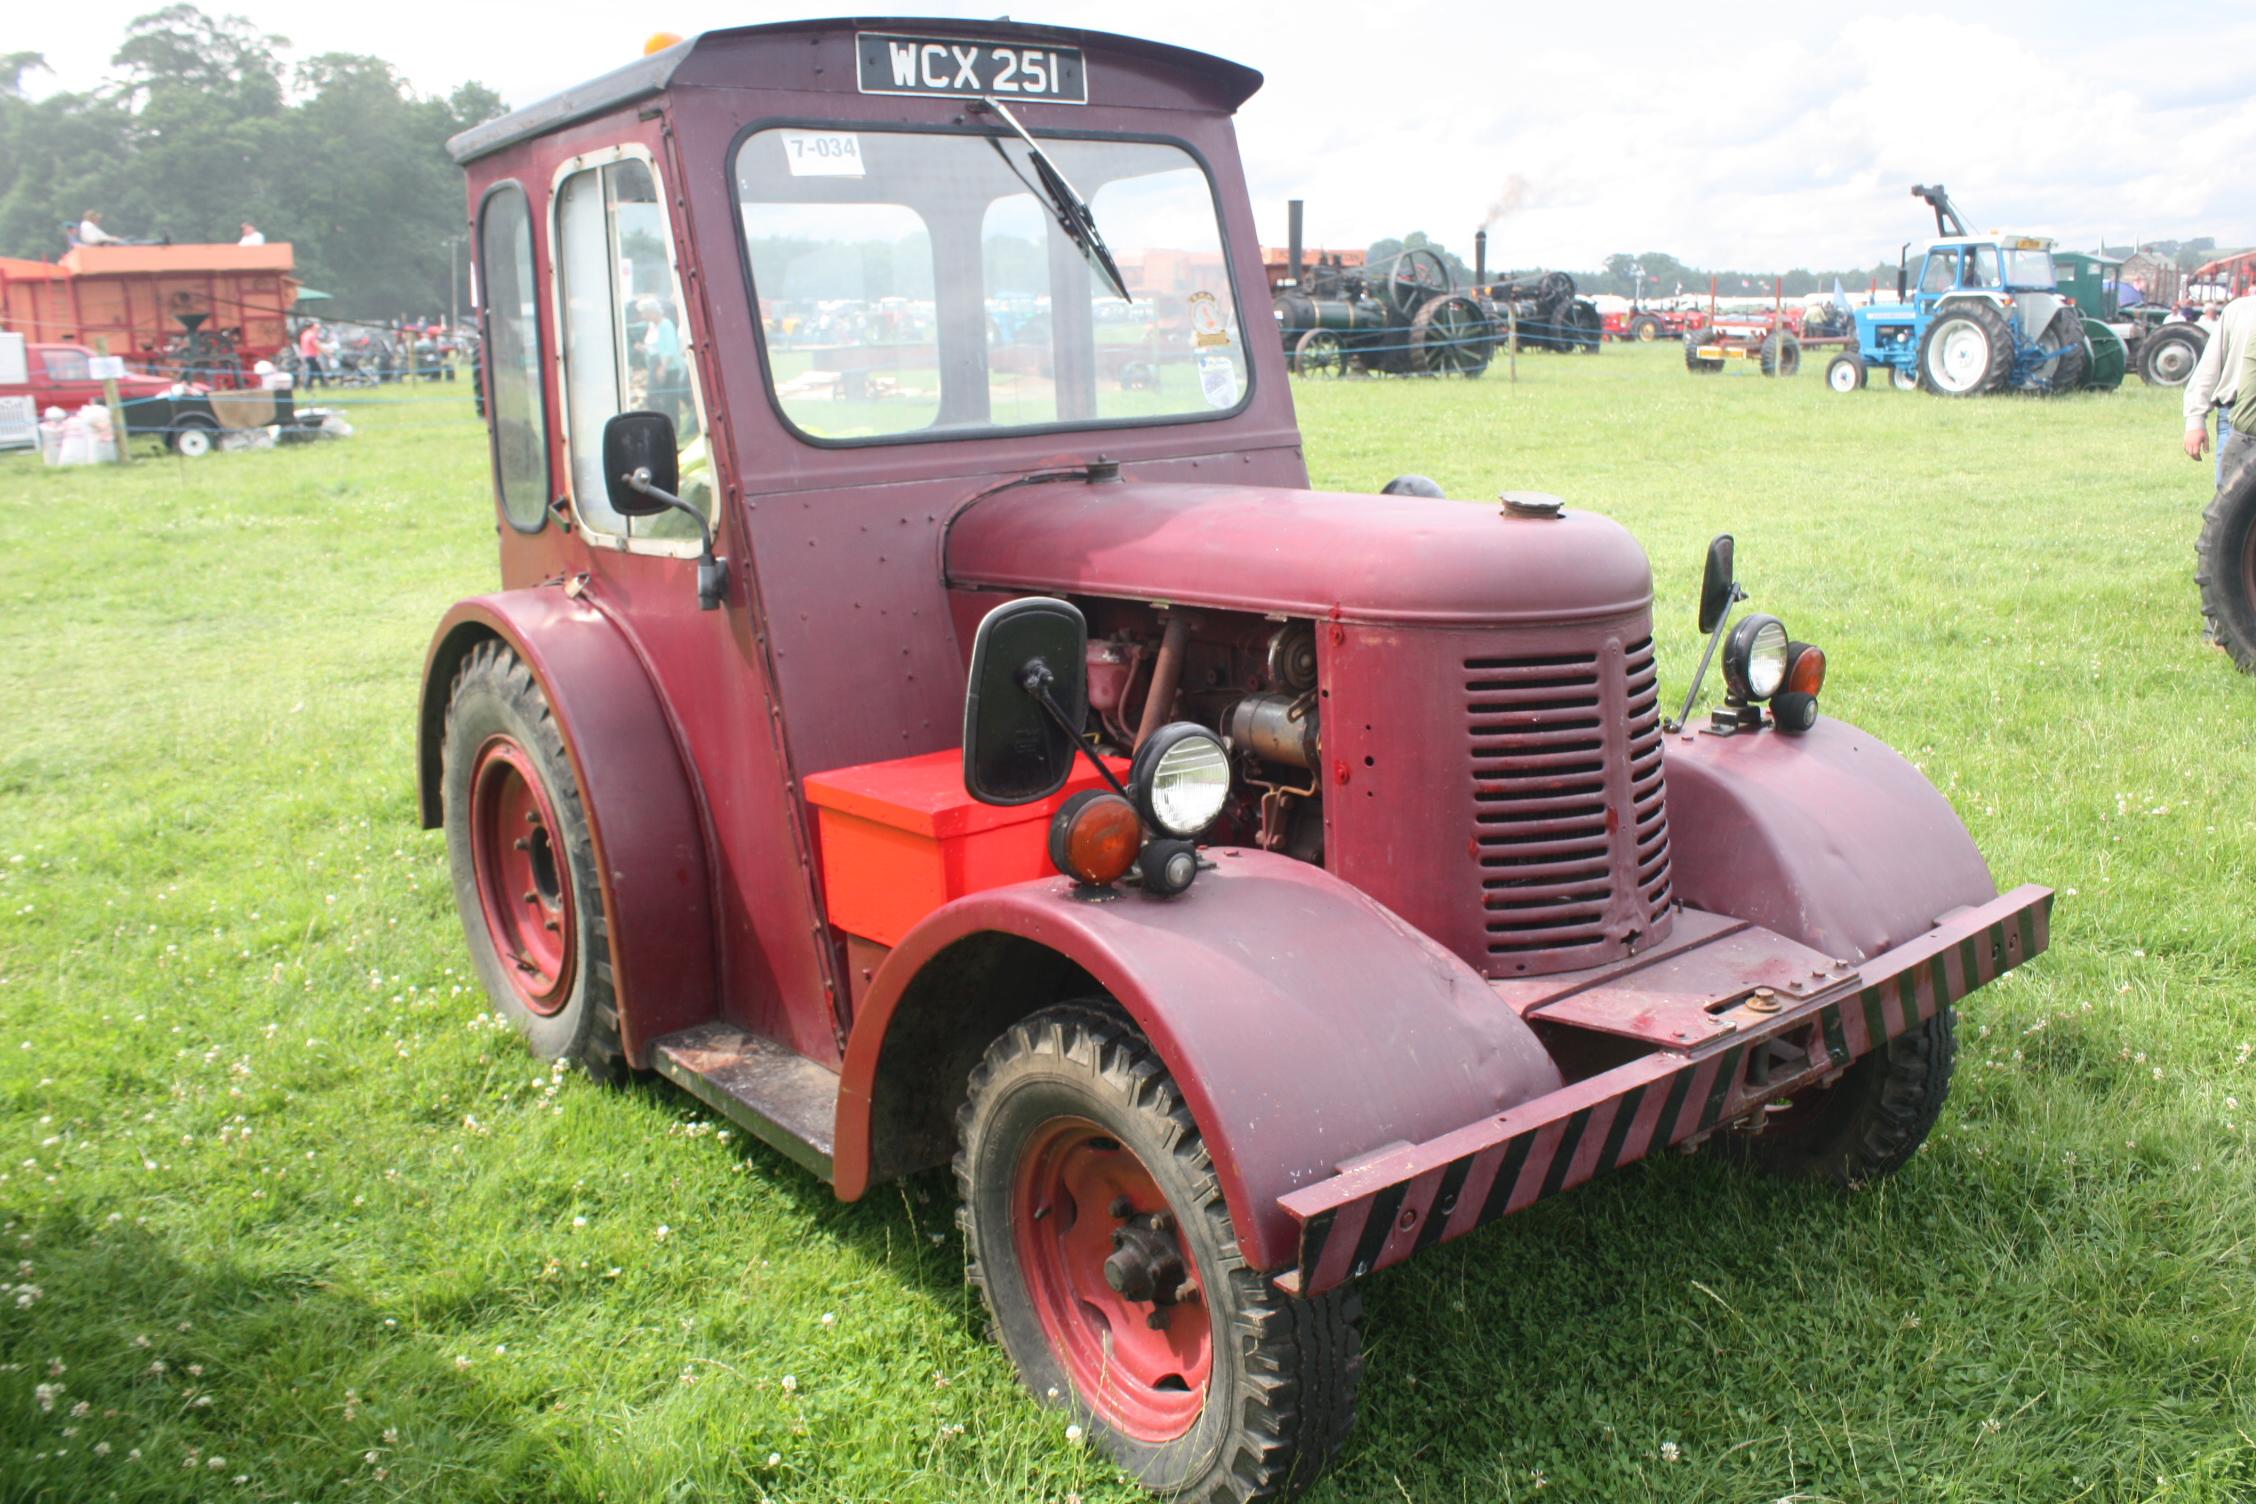 1020 Gas Updatemore Advice Needed Yesterdays Tractors – John Deere 1020 Wiring Harness